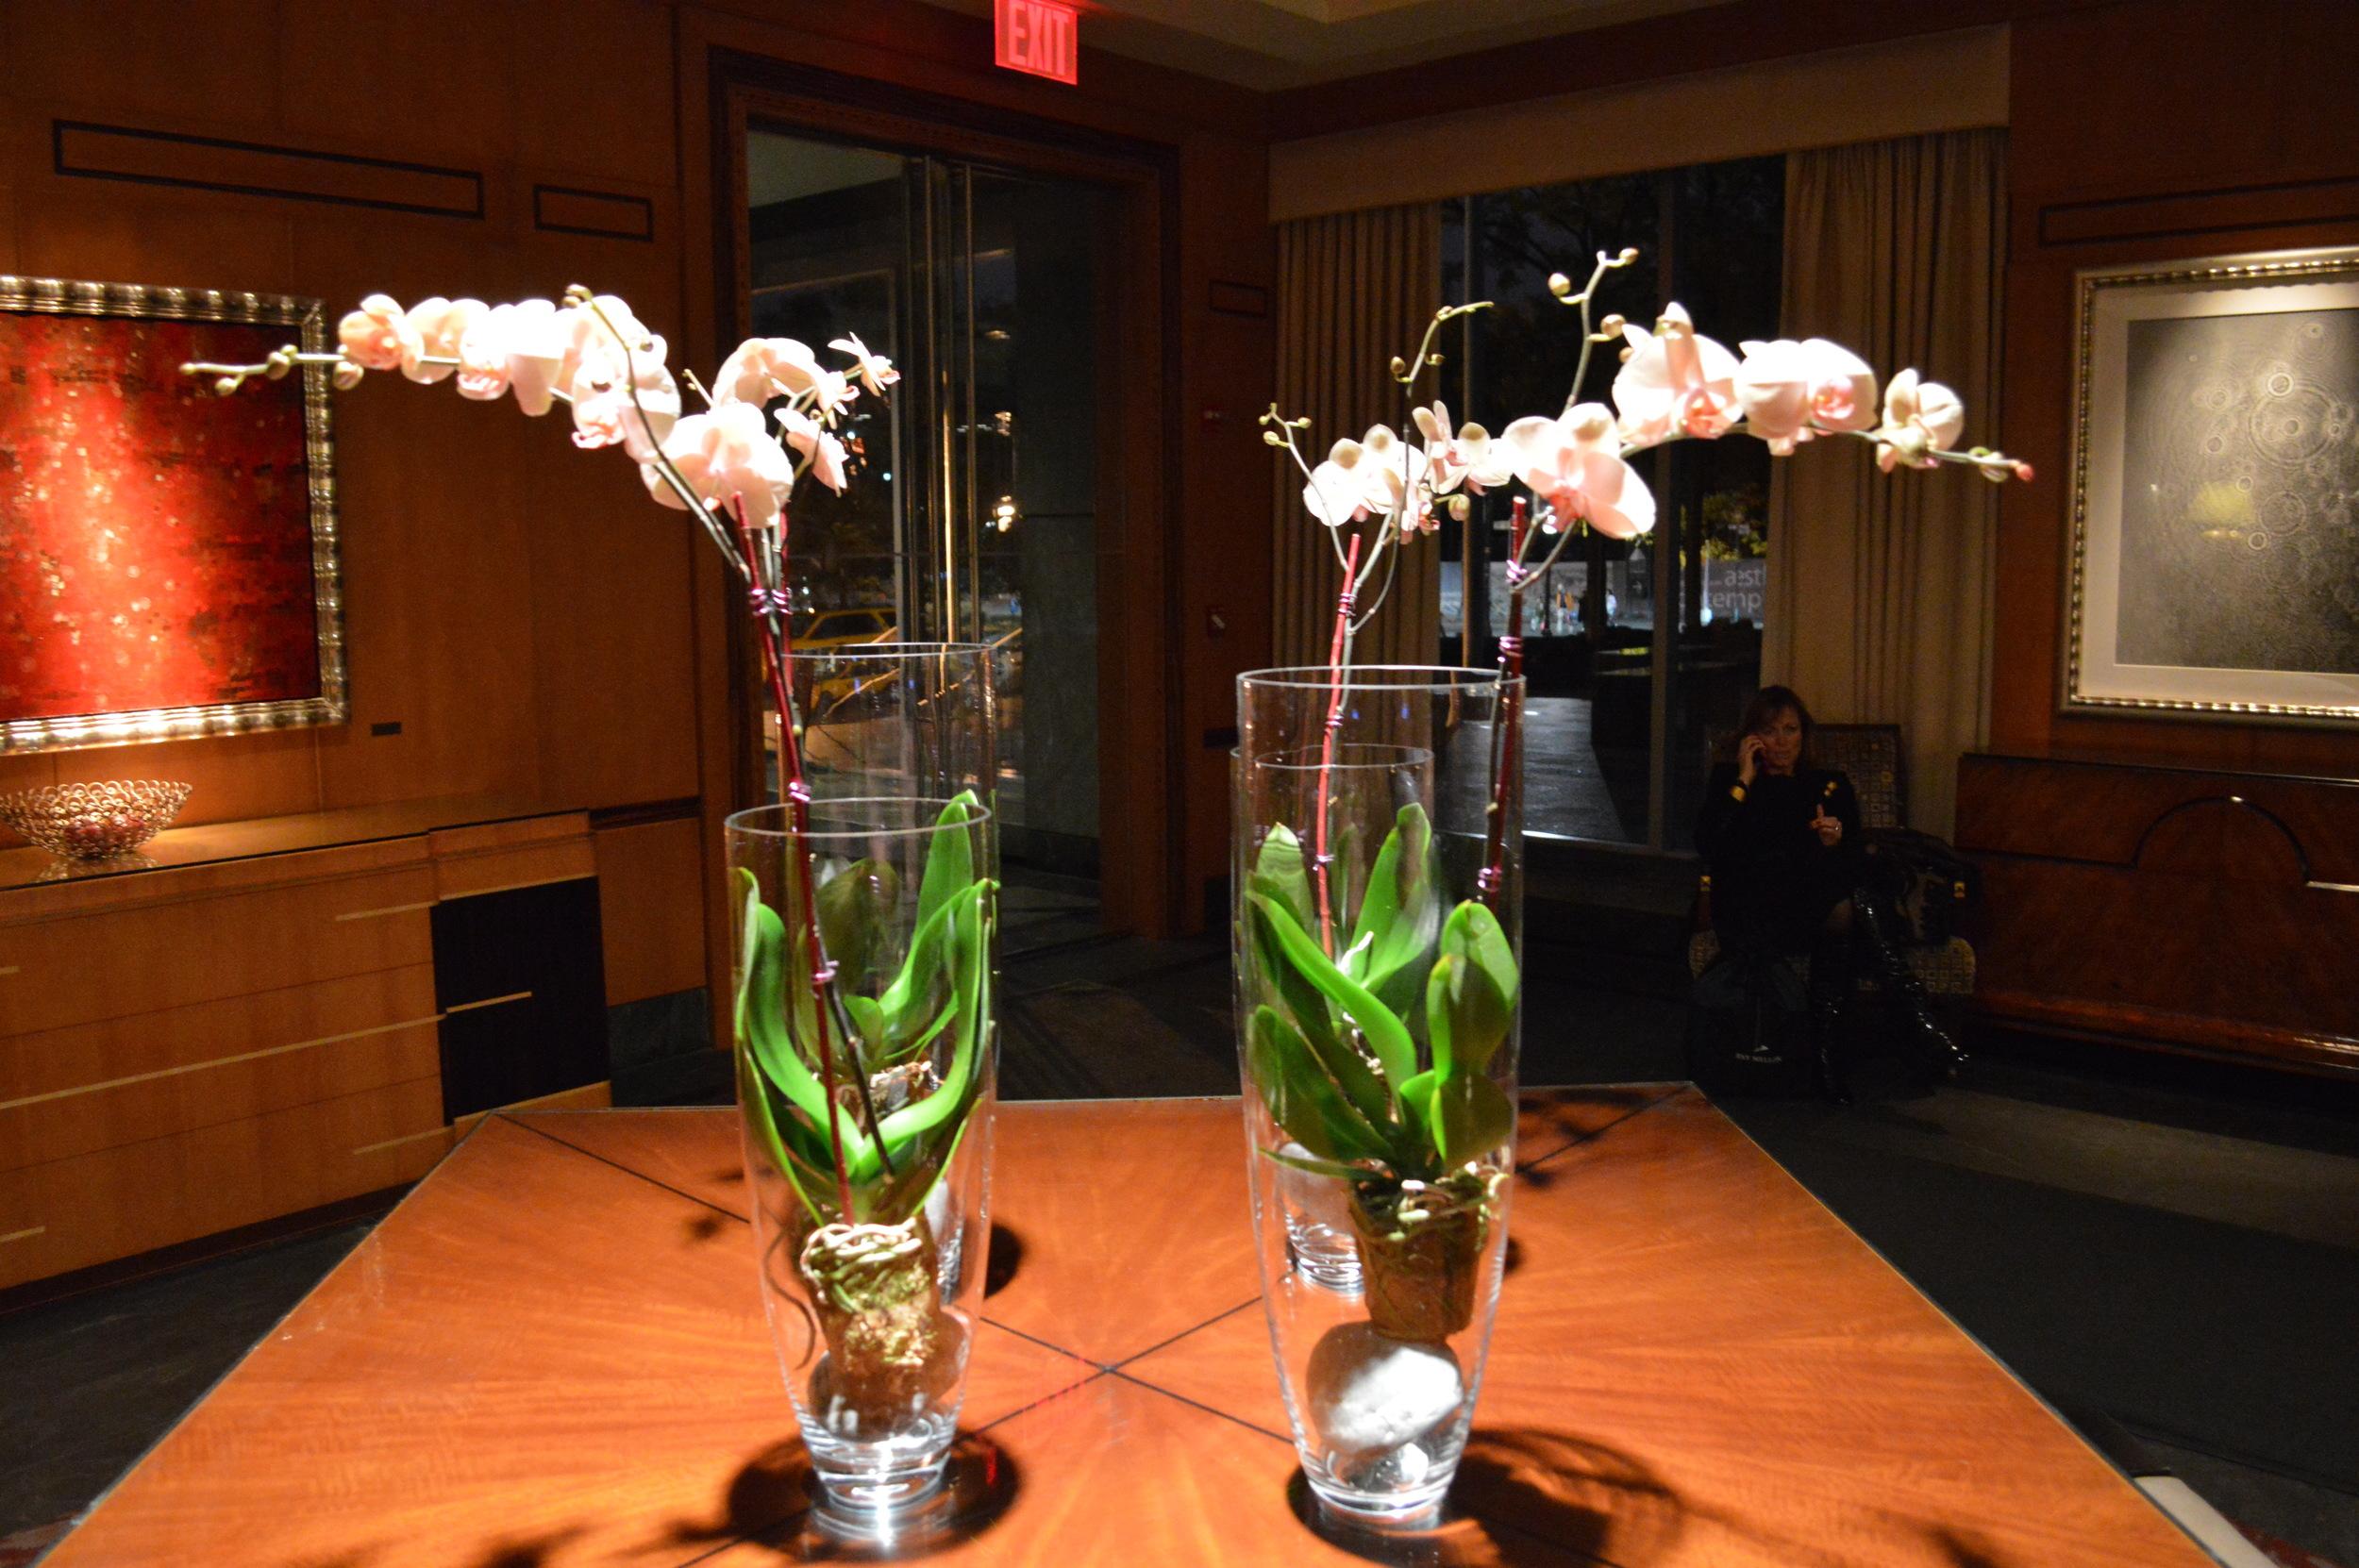 Ritz Carlton Orchids